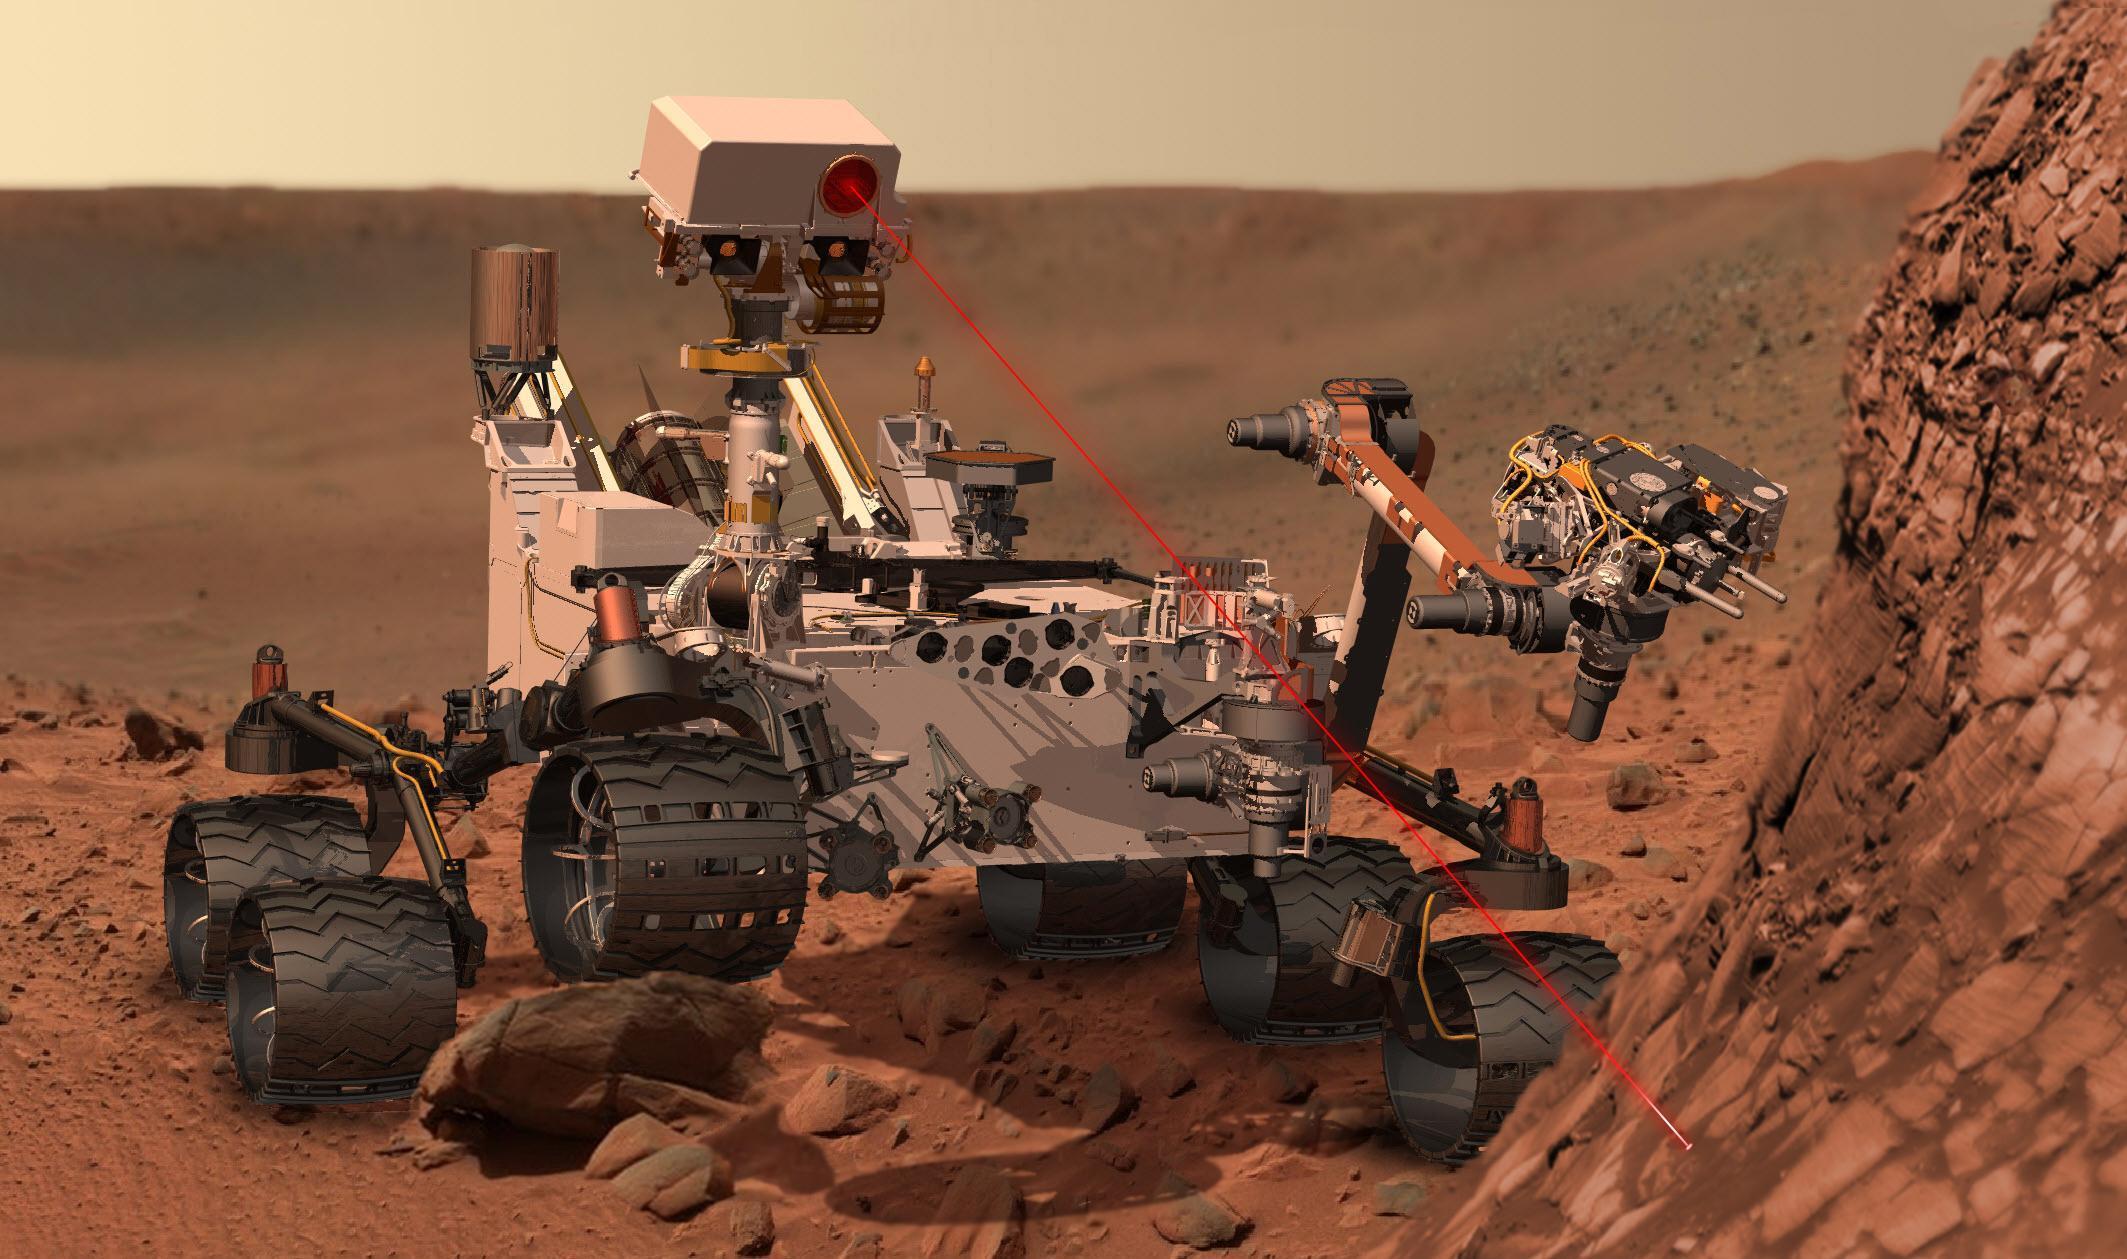 curiosity mars mission - HD2127×1259